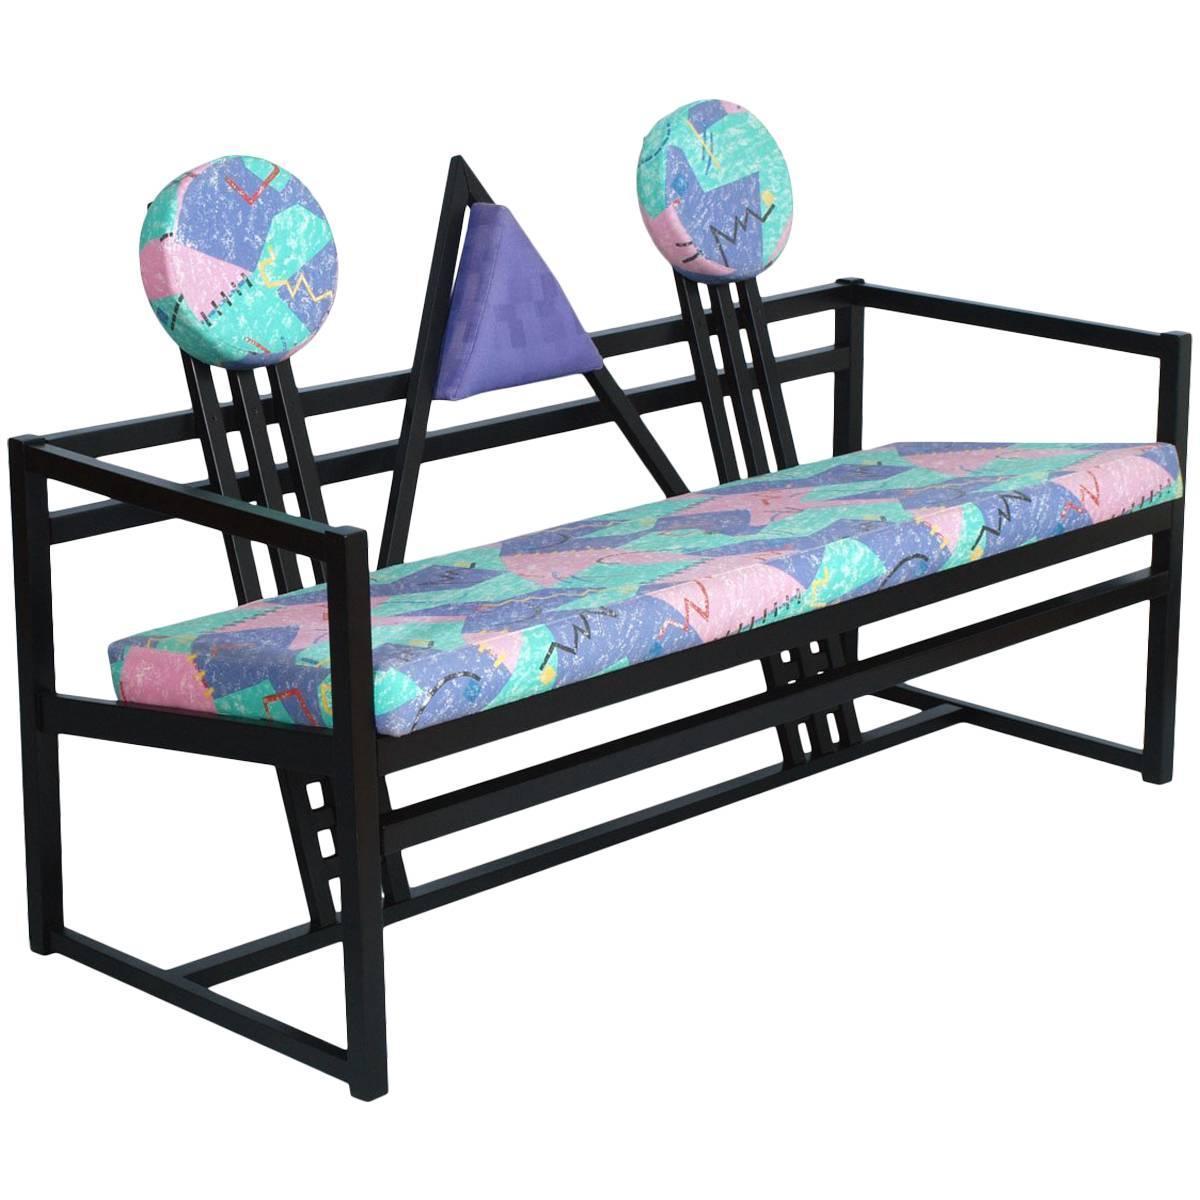 Superb Mid Century Bench Sofa In The Manner Of The Neo Plasticist Gerrit Rietveld Spiritservingveterans Wood Chair Design Ideas Spiritservingveteransorg